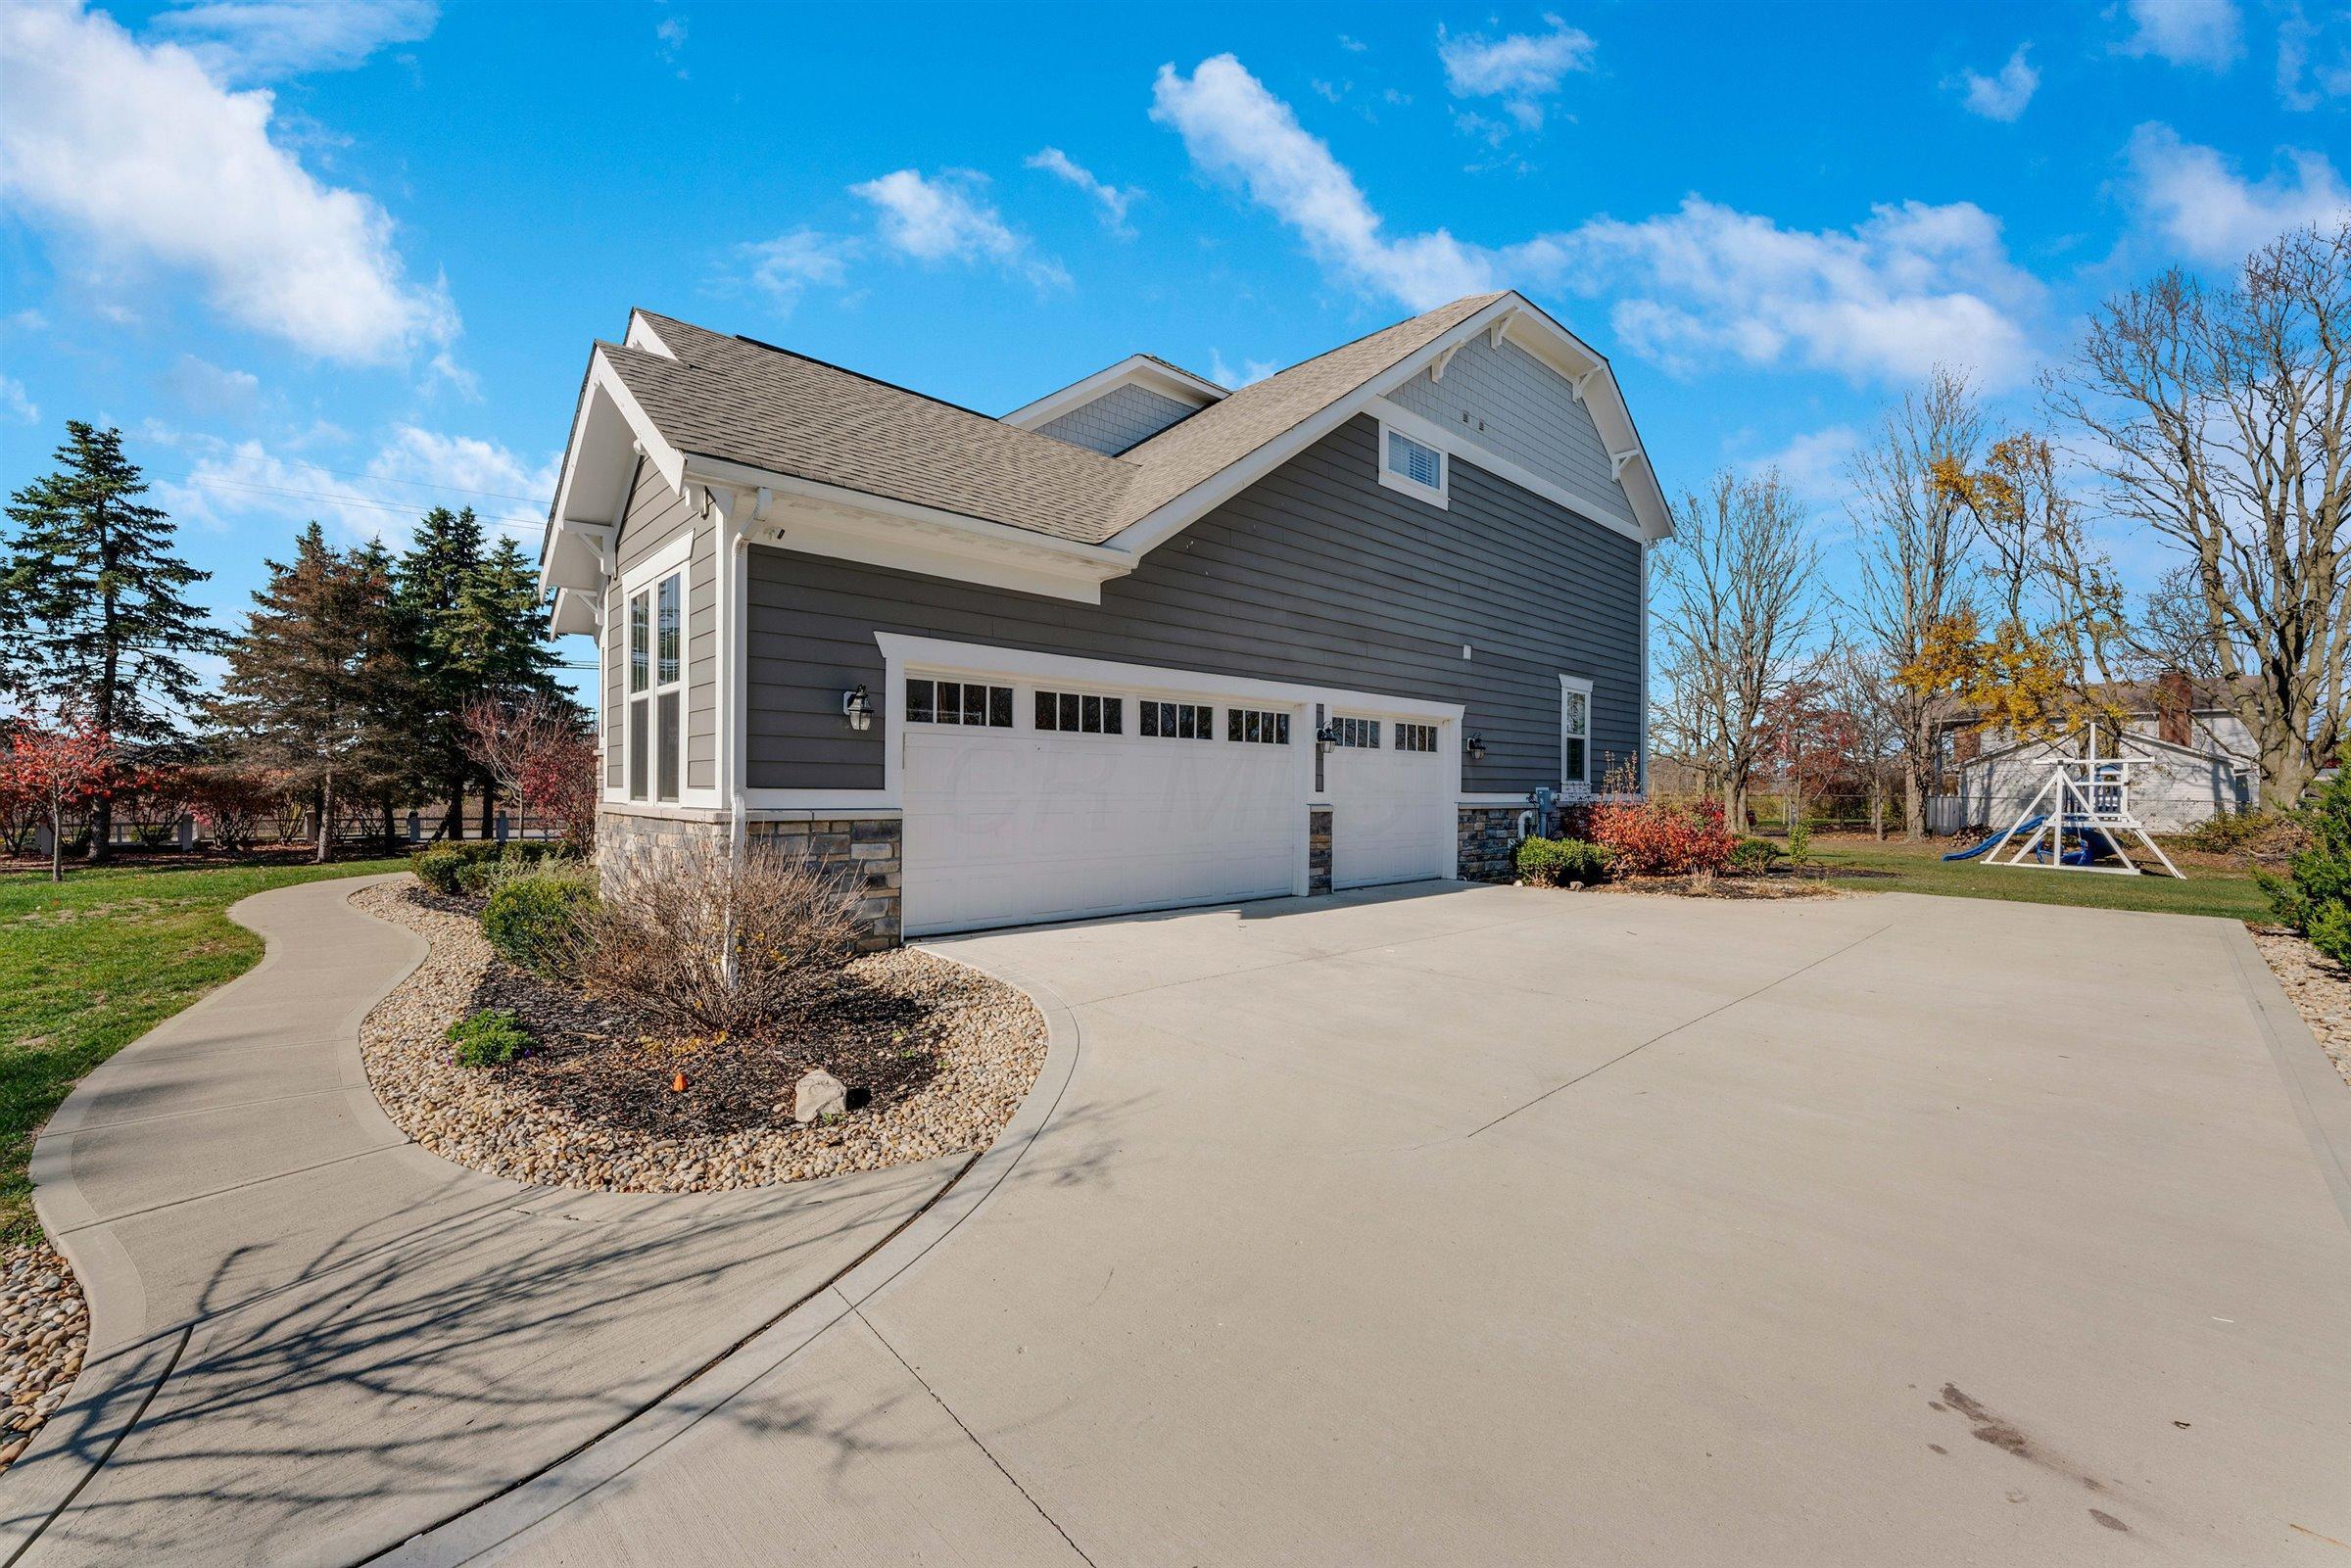 6332 Heritage Lakes Drive, Hilliard, Ohio 43026, 4 Bedrooms Bedrooms, ,4 BathroomsBathrooms,Residential,For Sale,Heritage Lakes,220040262